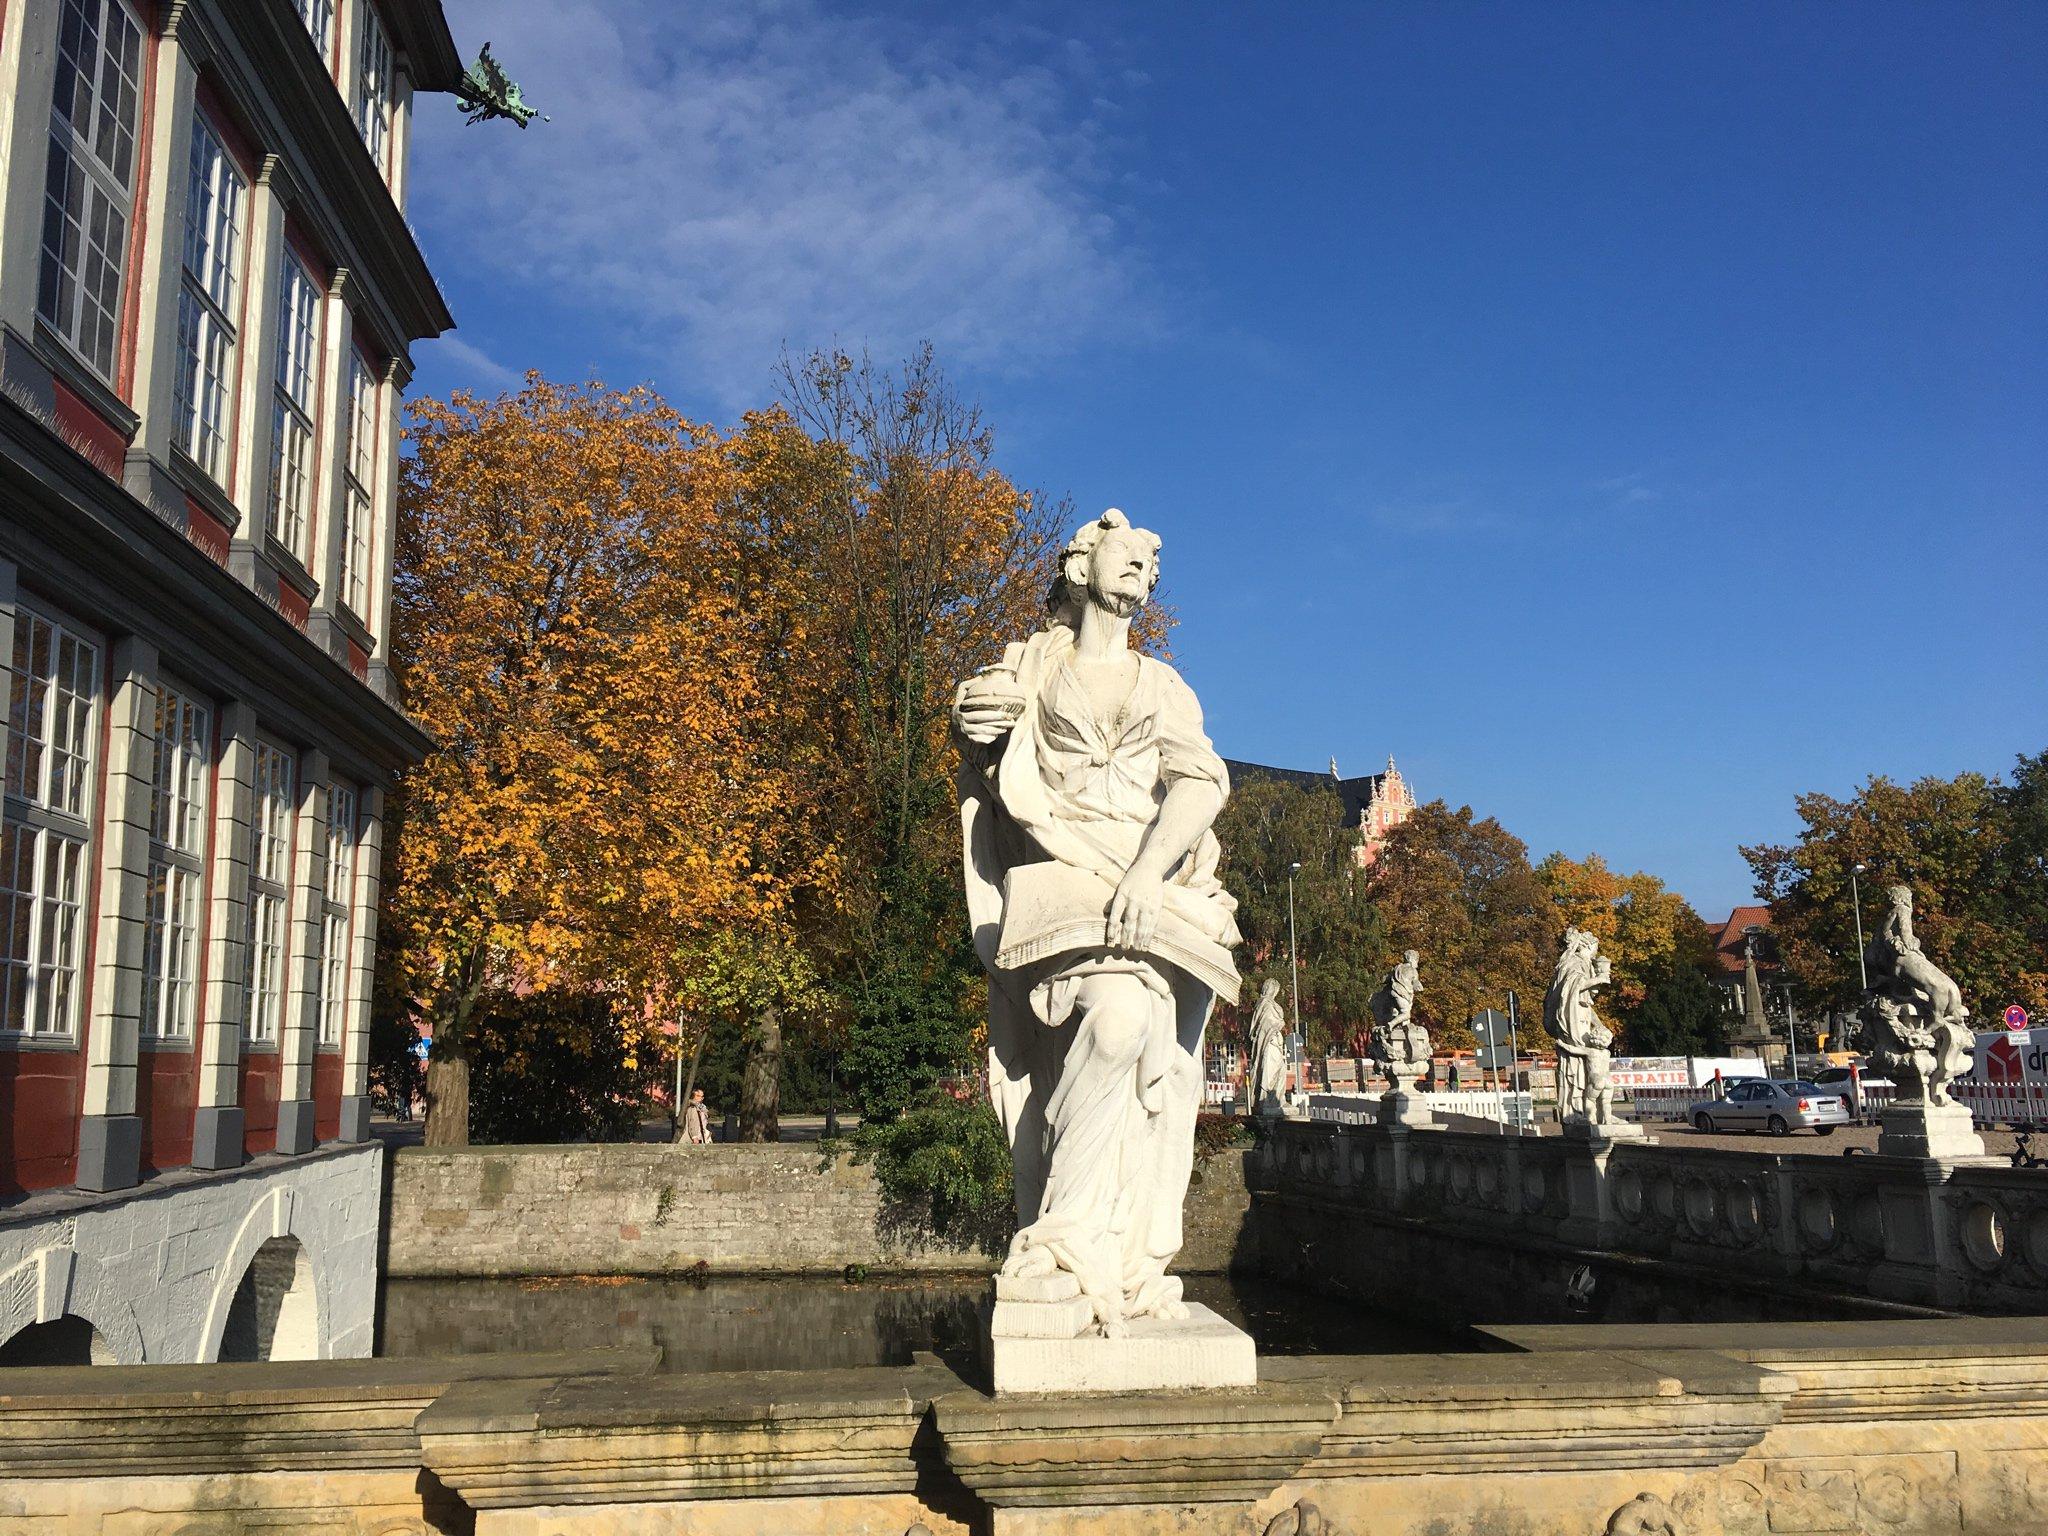 Die Herbstsonne genießen #meurers #echtlessig https://t.co/F7vE8GHkyp